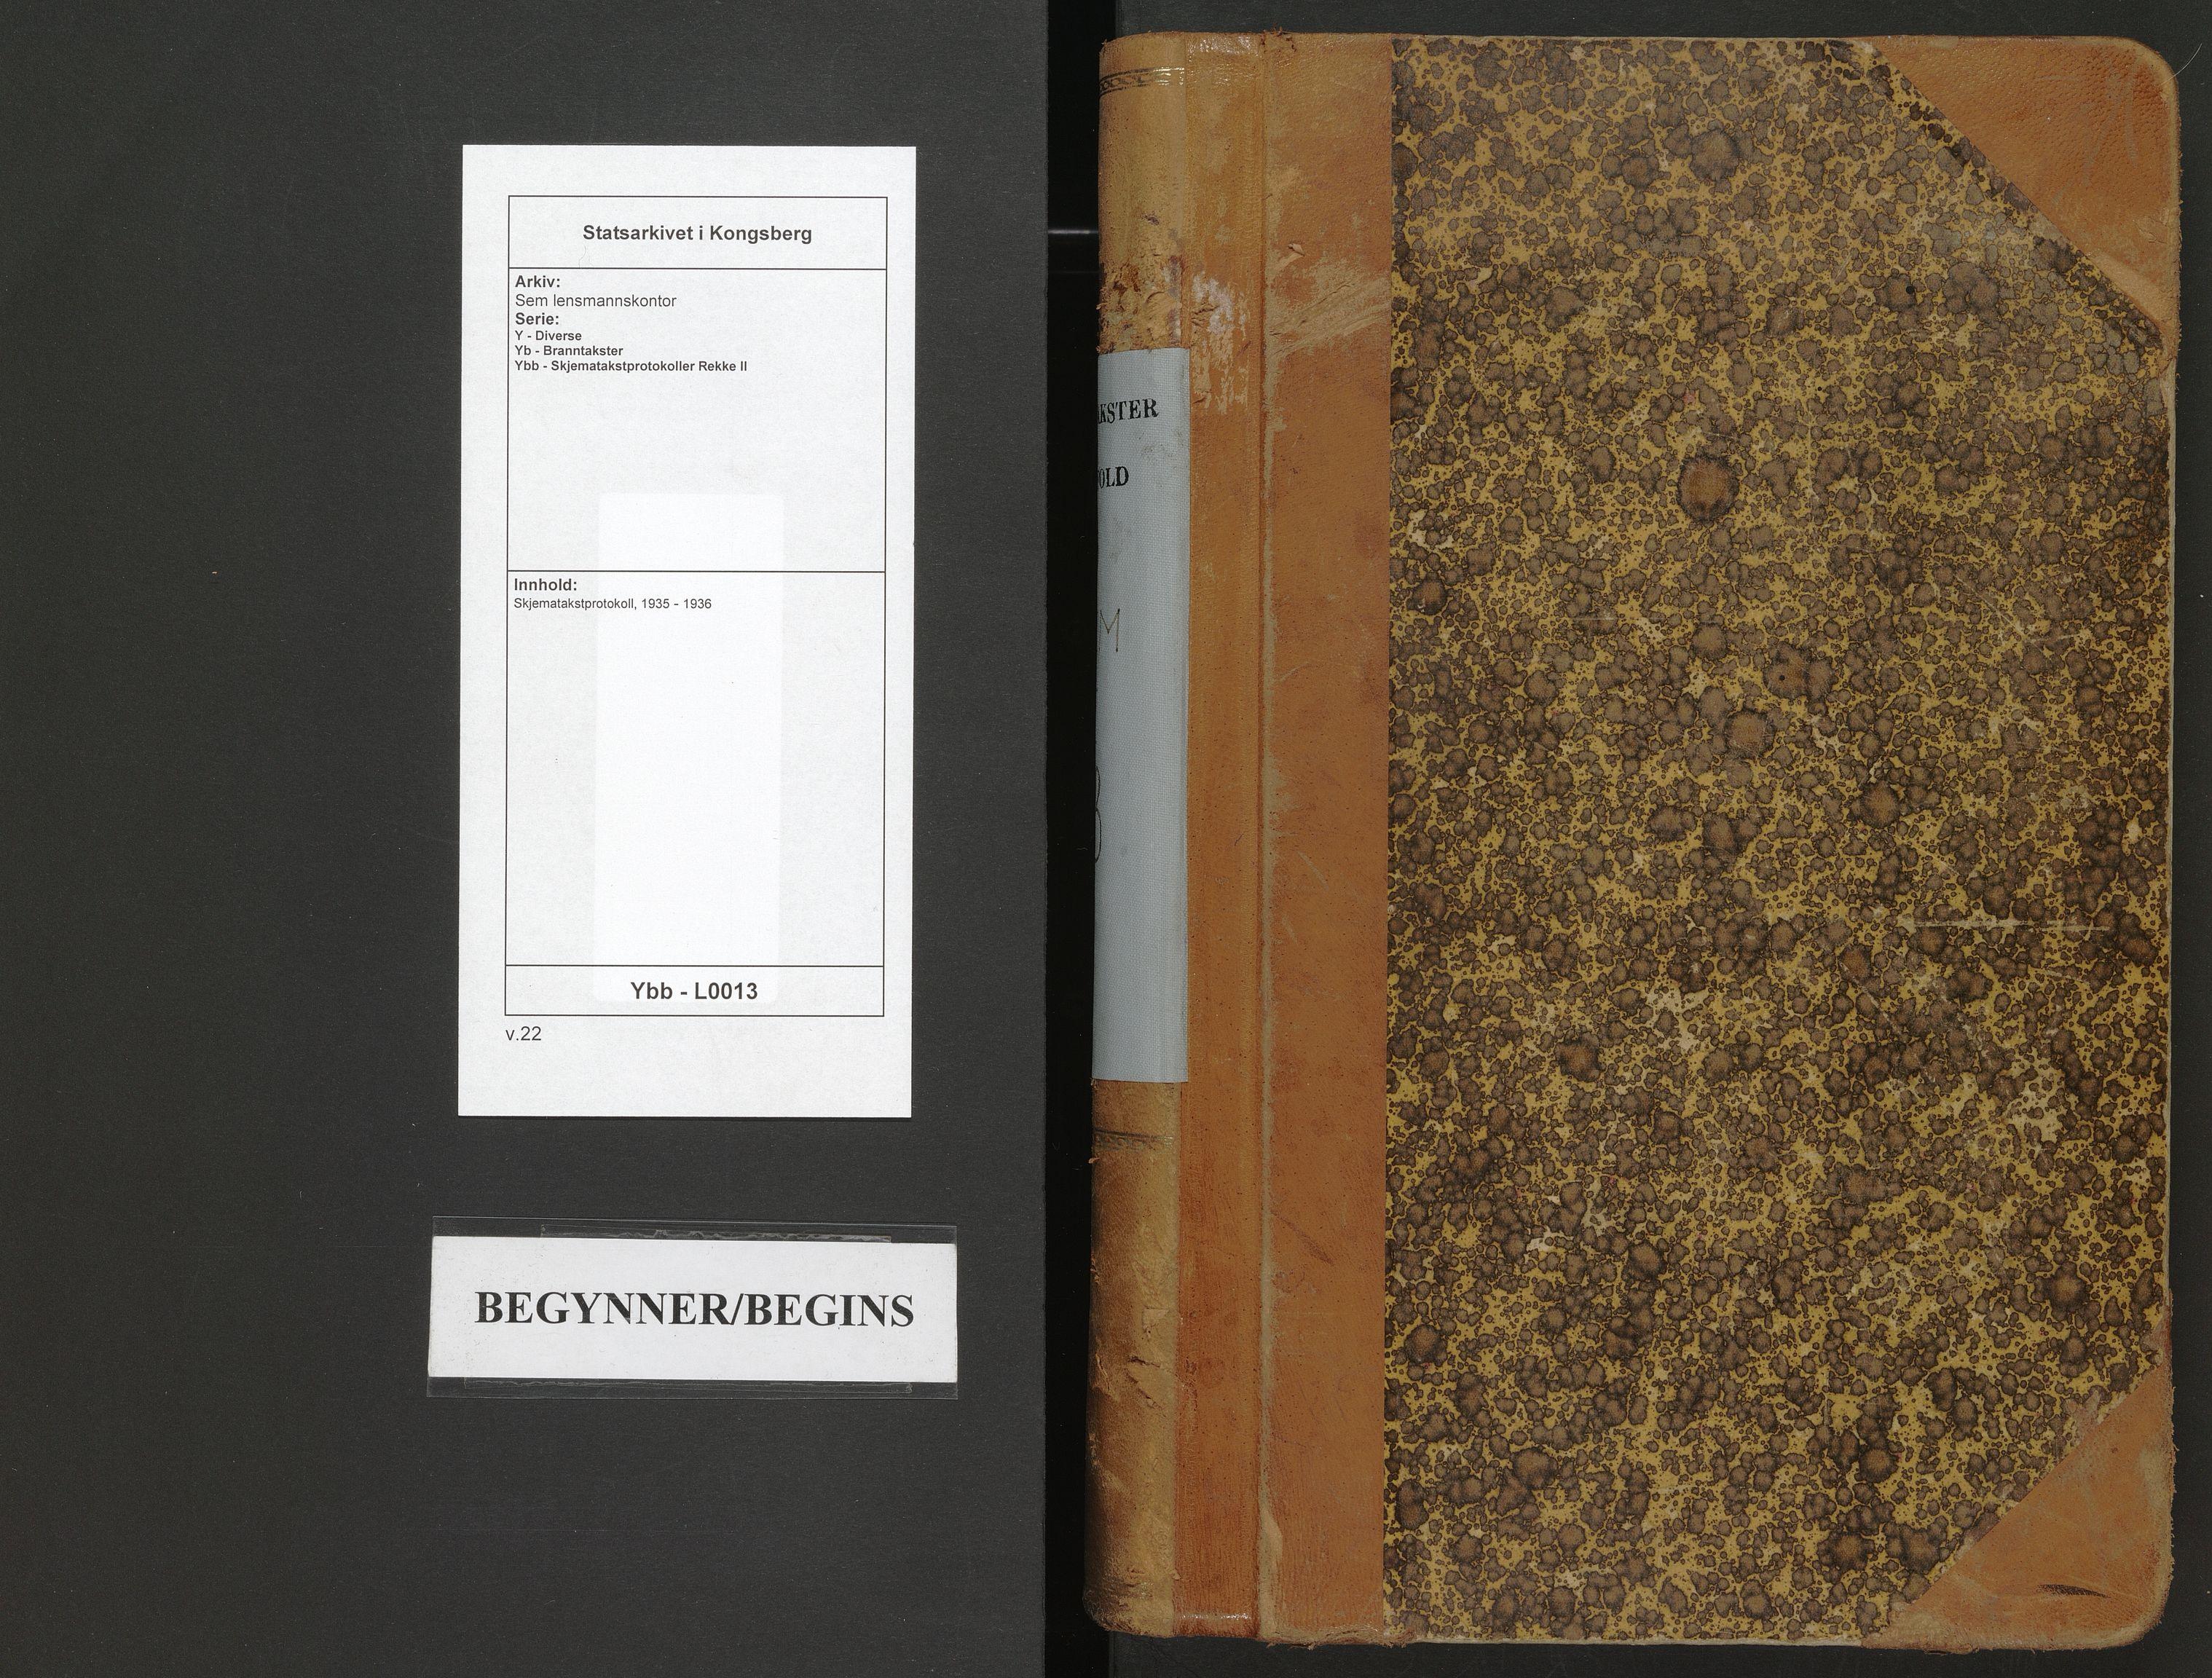 SAKO, Sem lensmannskontor, Y/Yb/Ybb/L0013: Skjematakstprotokoll, 1935-1936